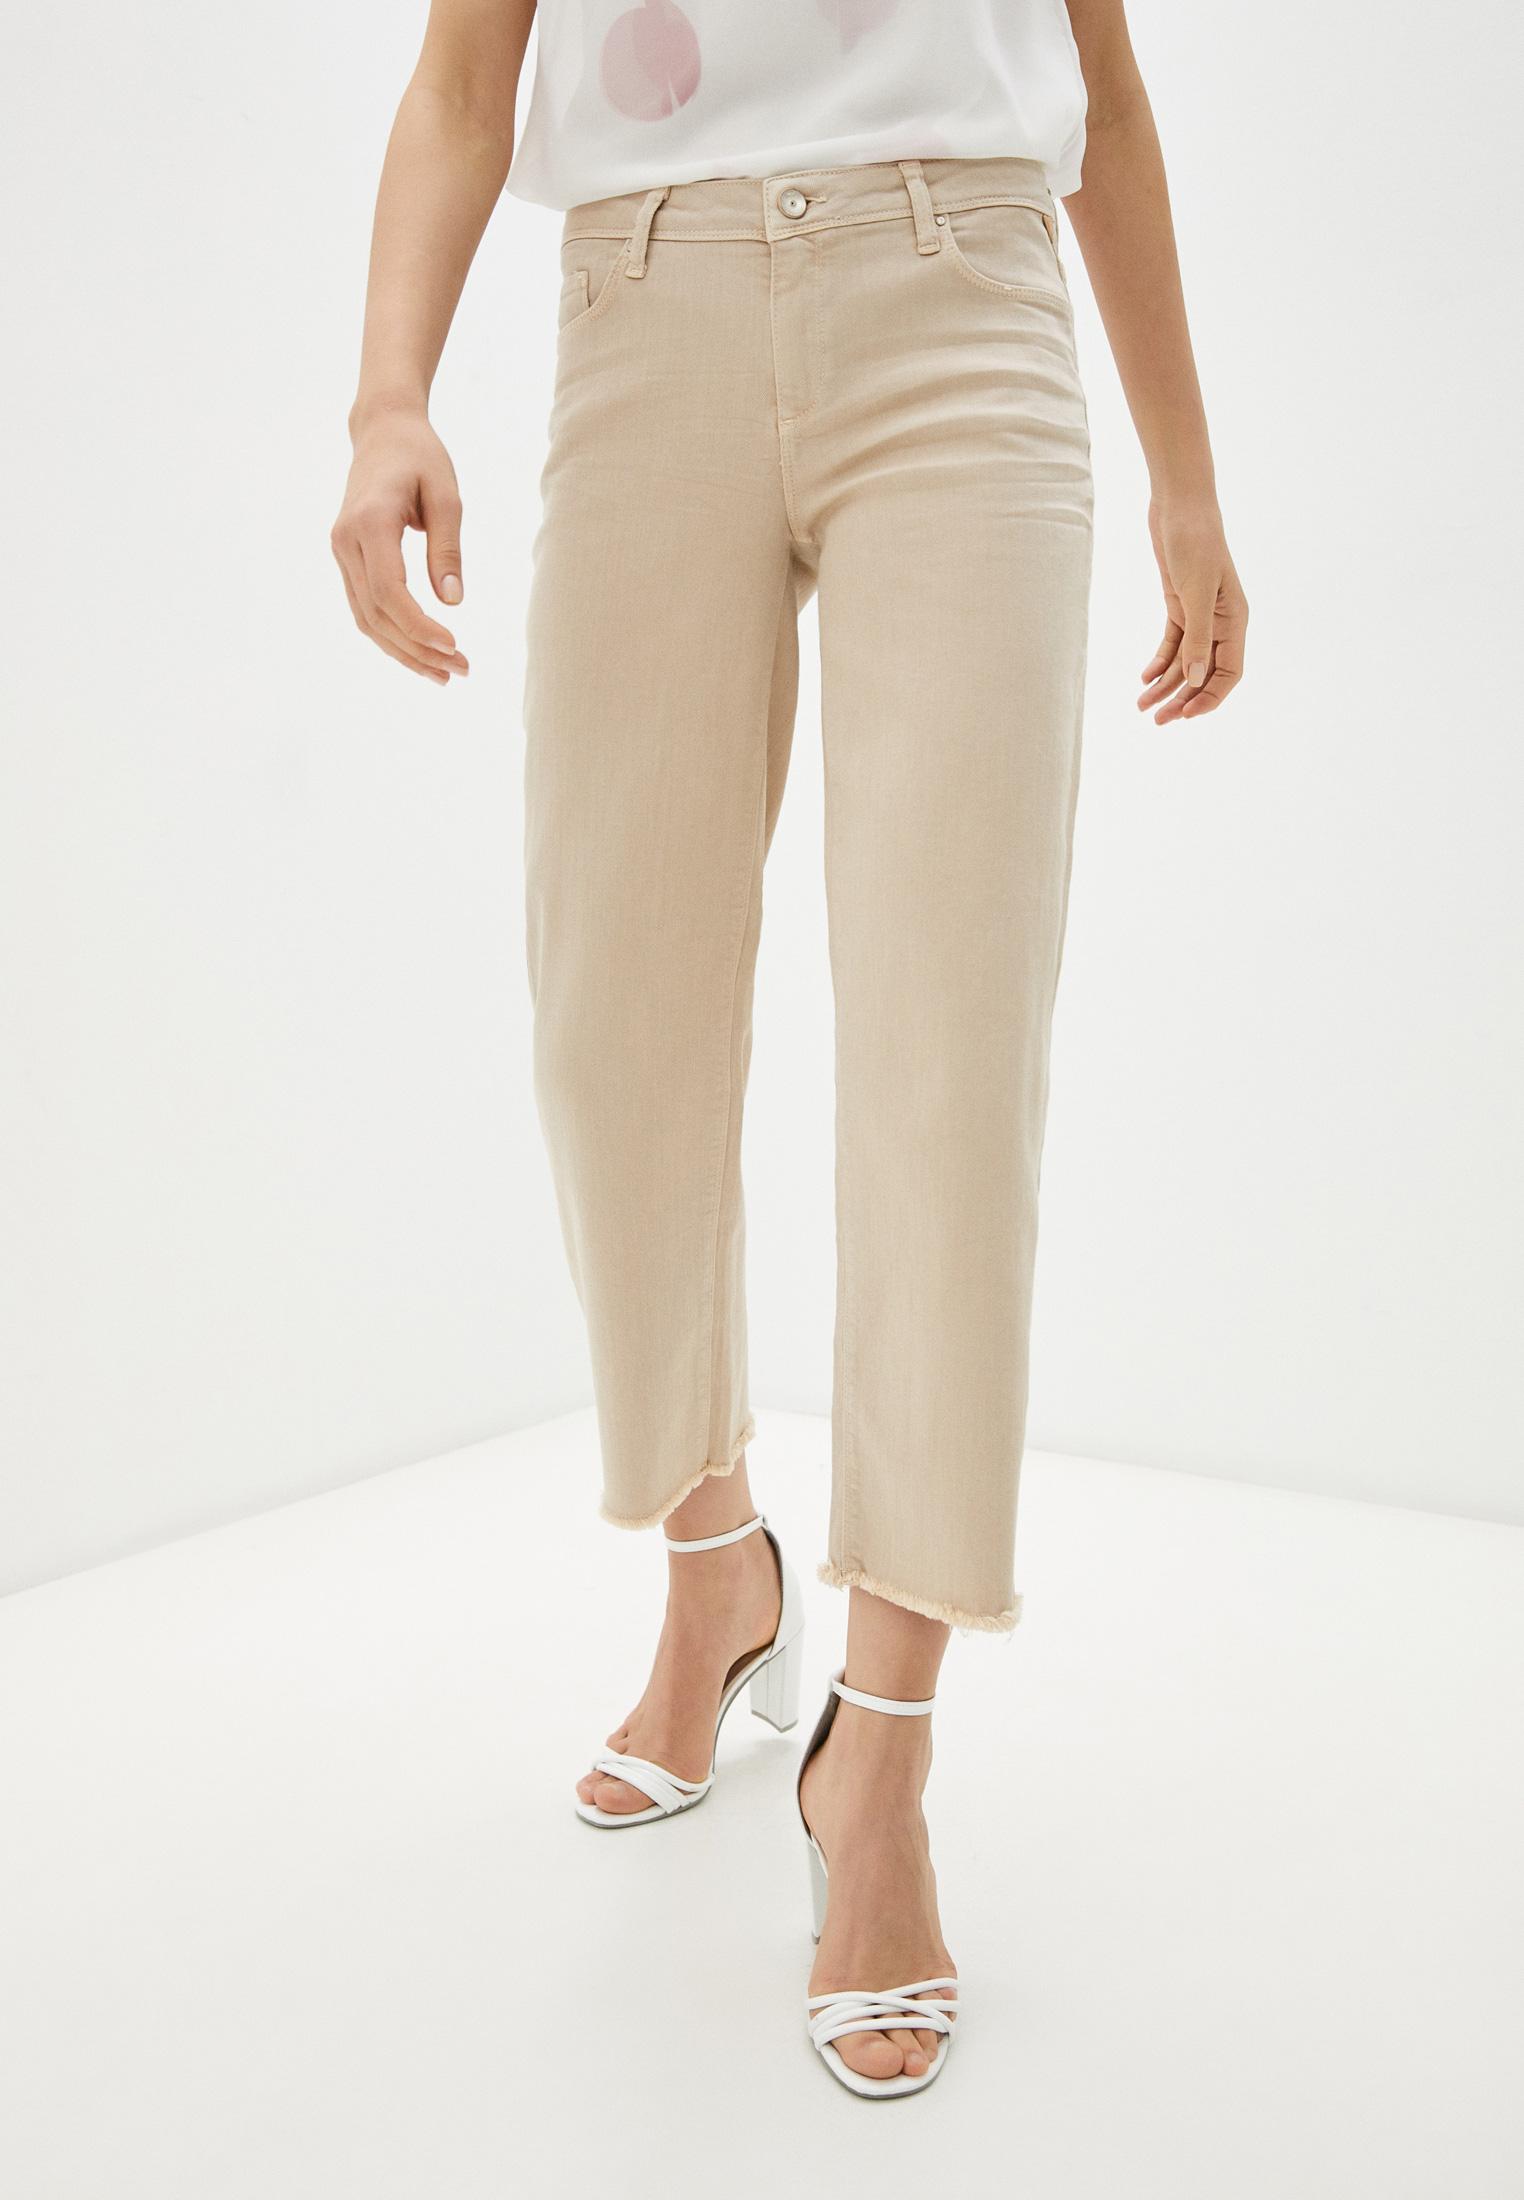 Женские прямые брюки Betty & Co Брюки Betty & Co